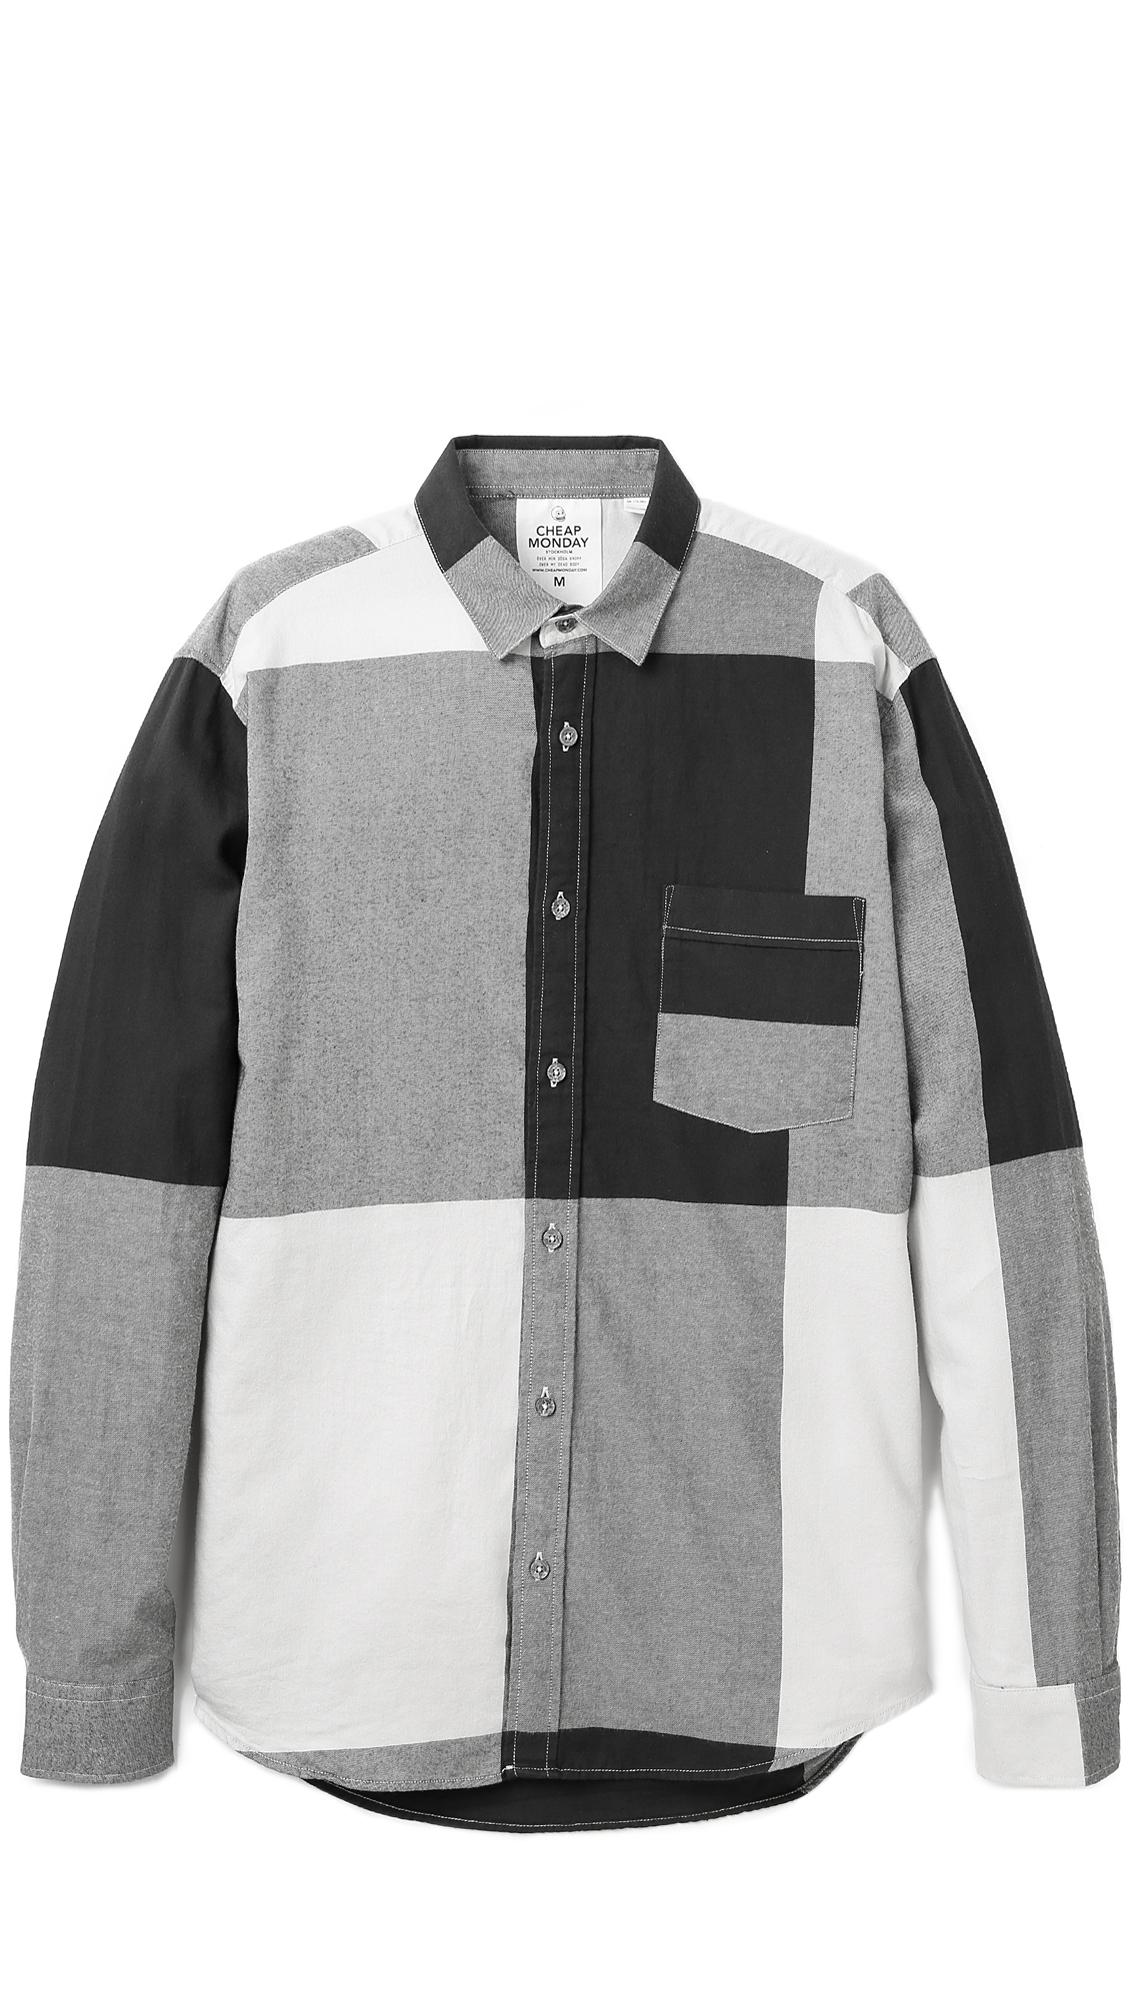 Cheap Monday Black Neo Flannel Shirt For Men Lyst